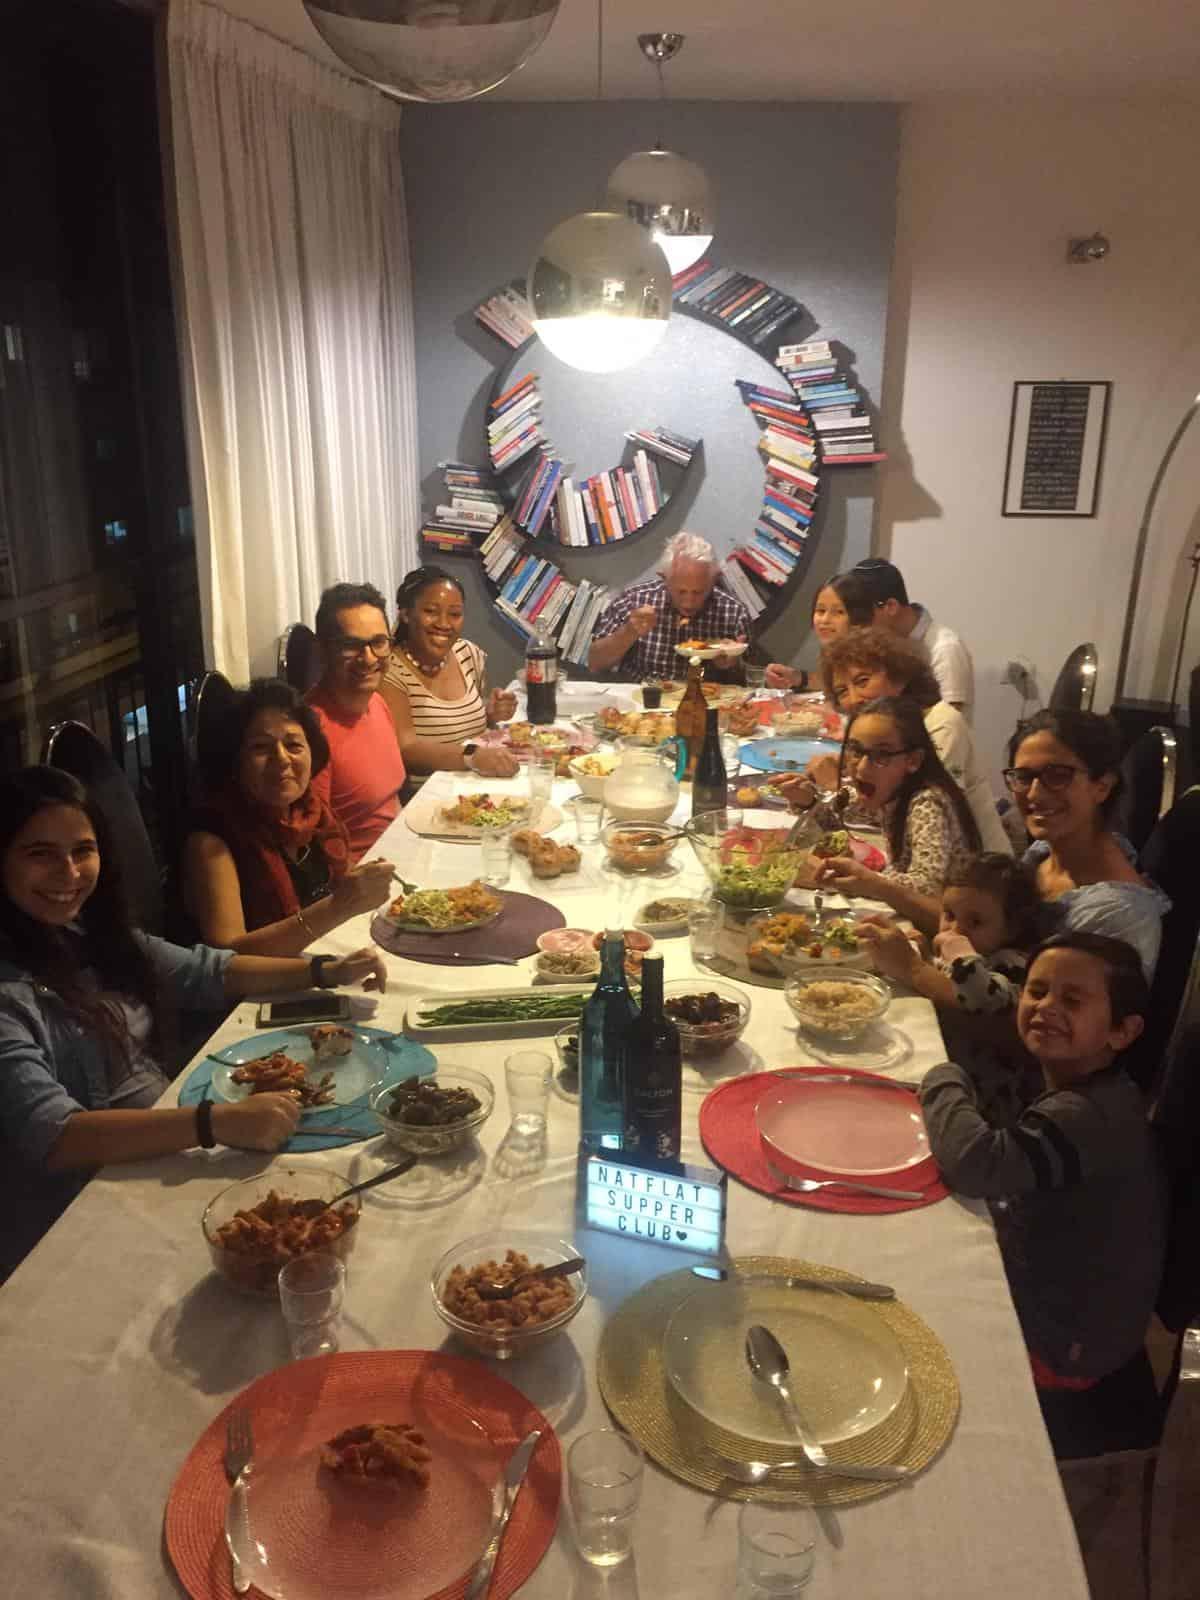 People set around a dinner table.